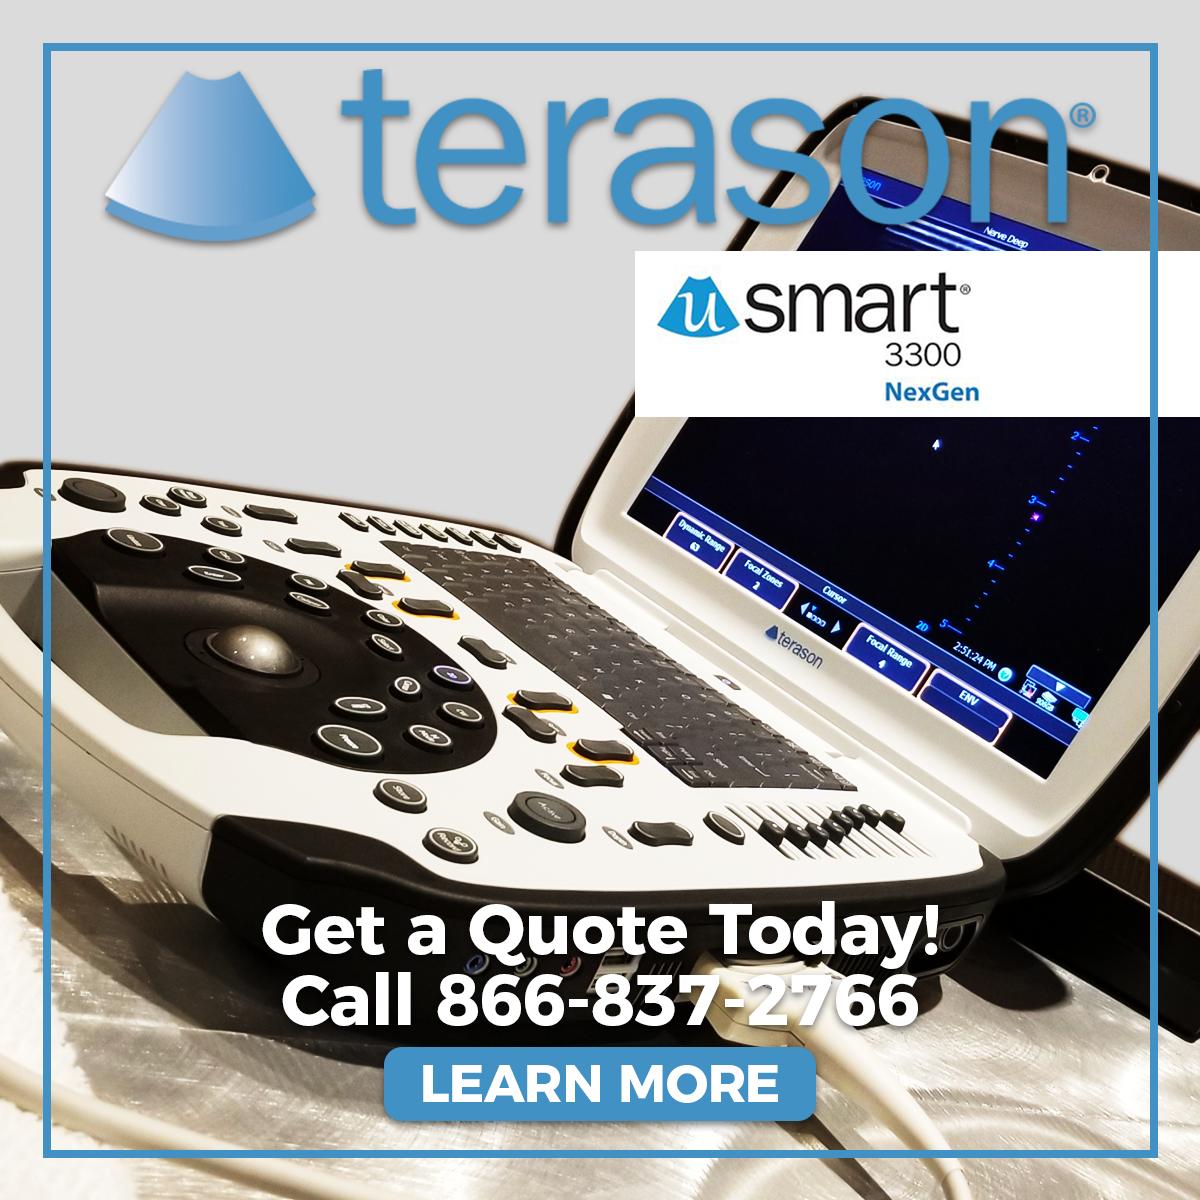 Copy of Copy of Terason Ultrasound